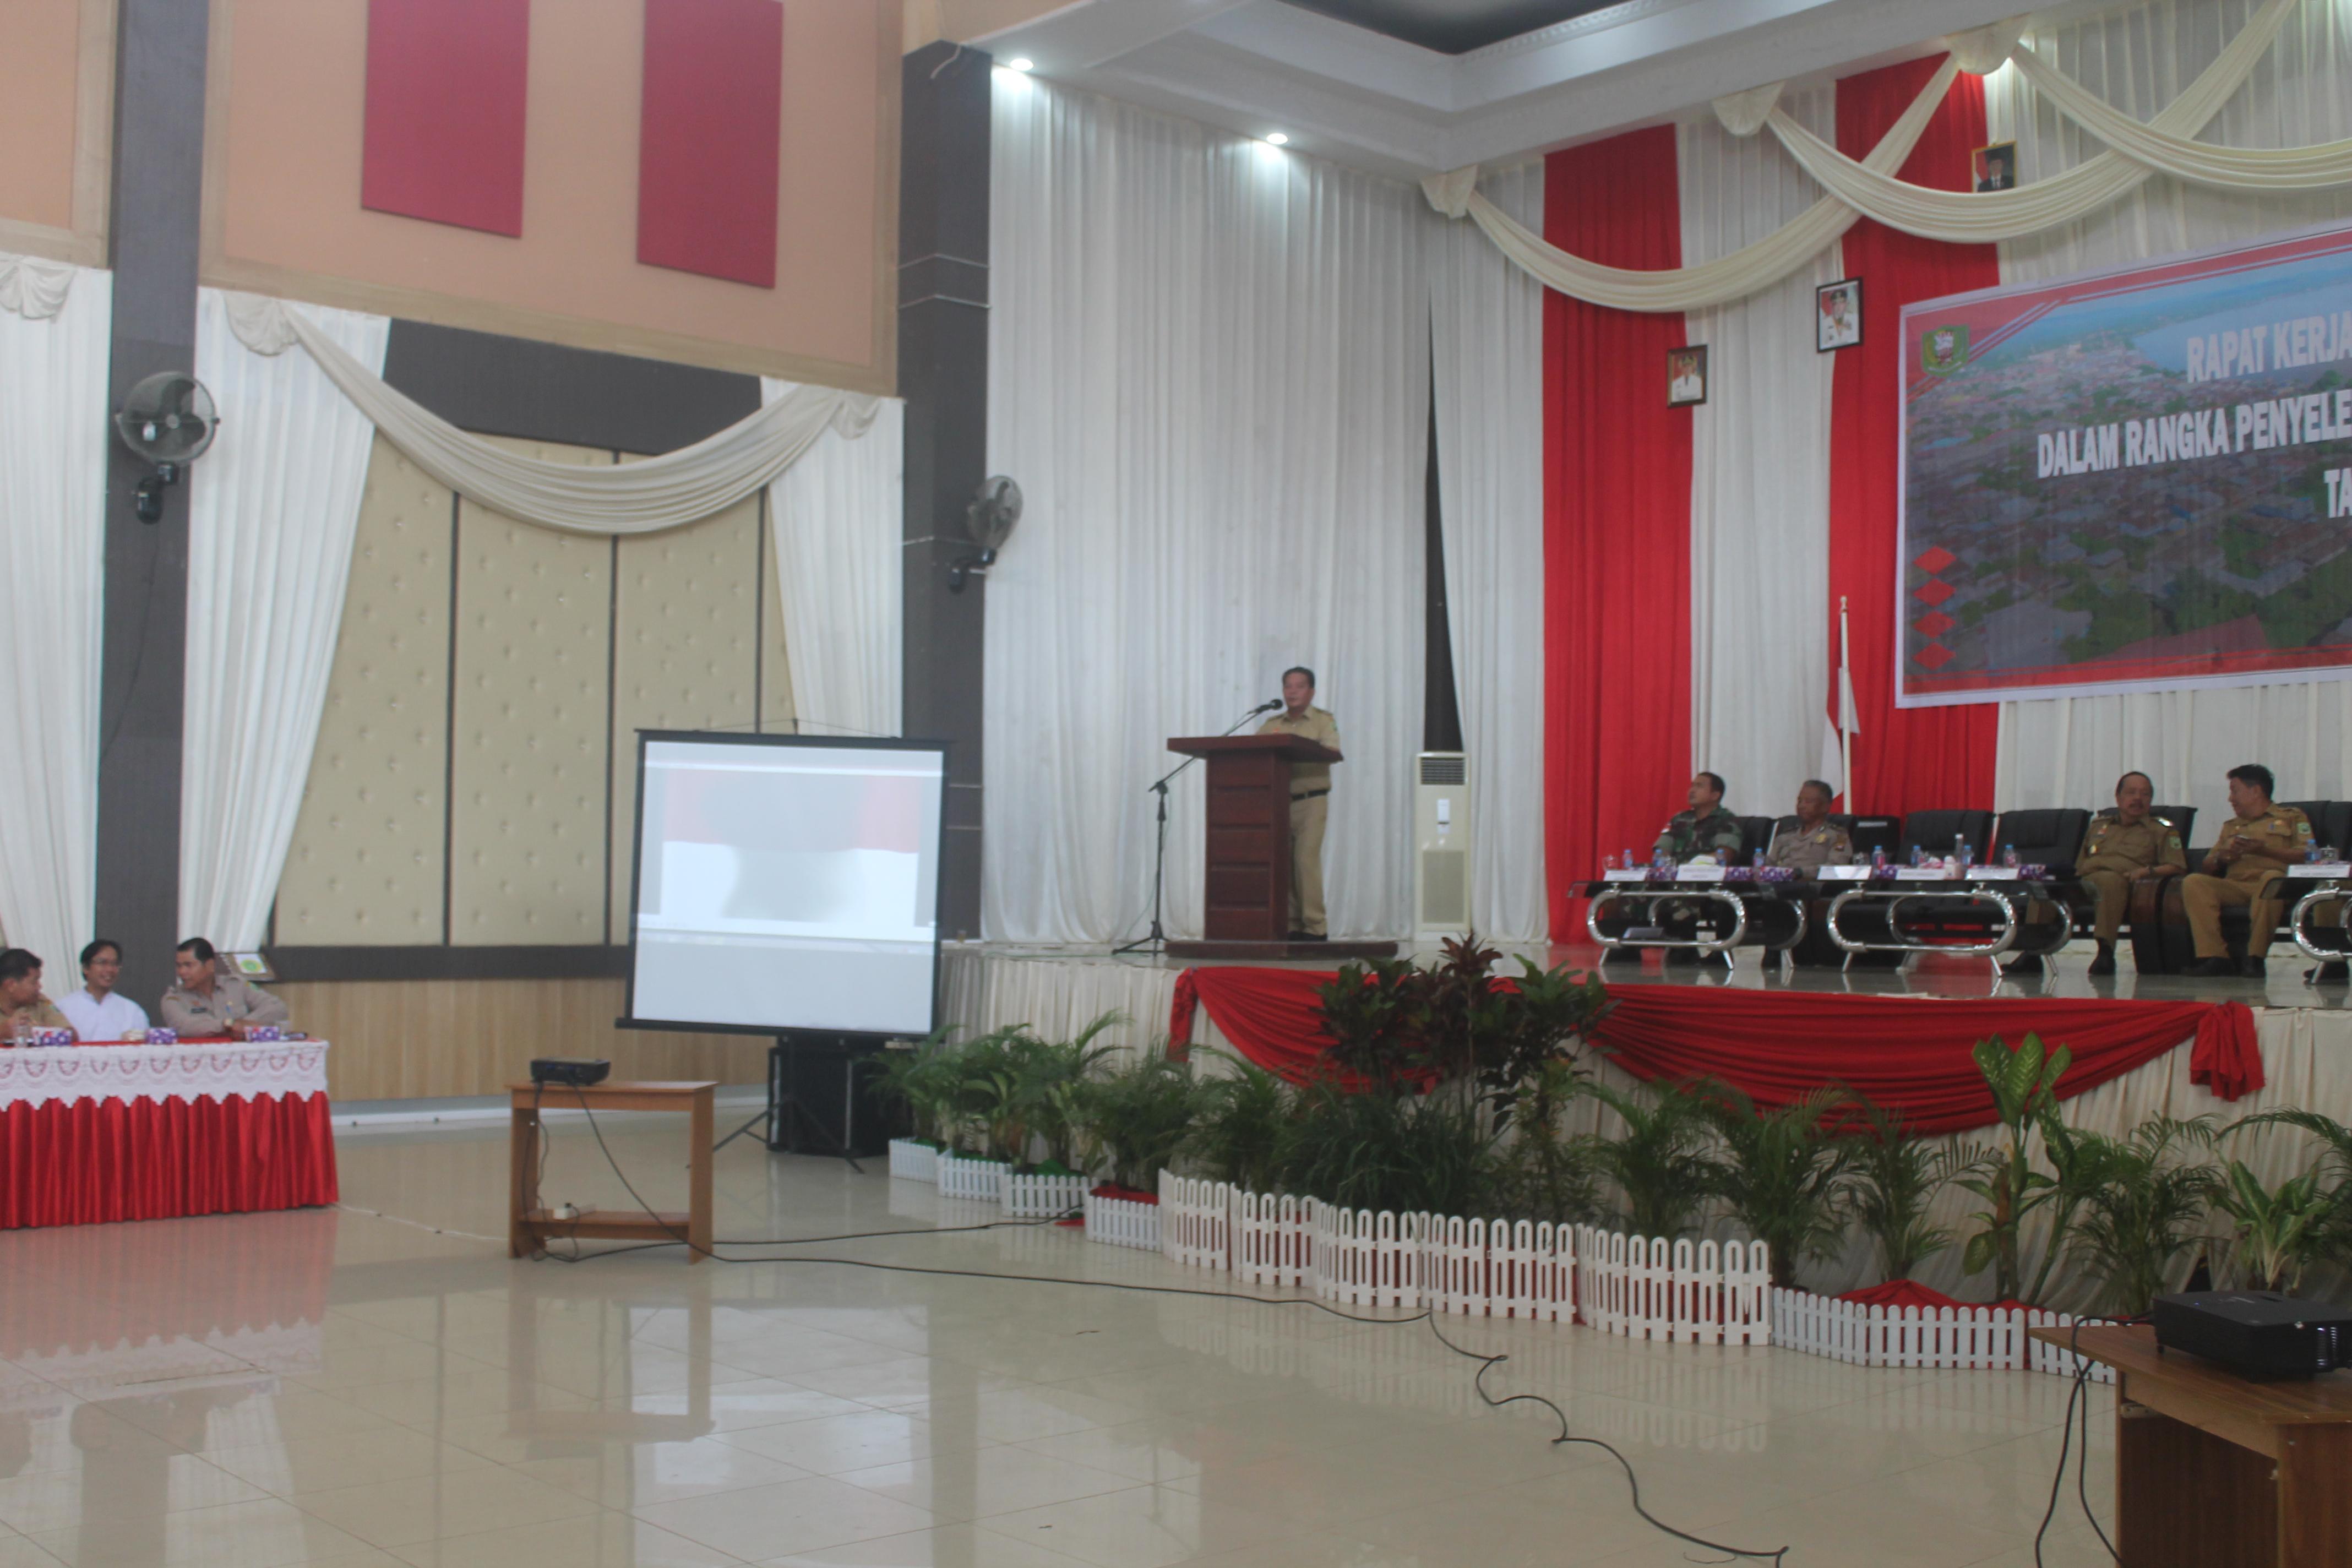 Rapat Kerja Kades, Lurah, BPD Dalam Rangka Penyelenggaraan Pemerintah Desa Tahun 2018